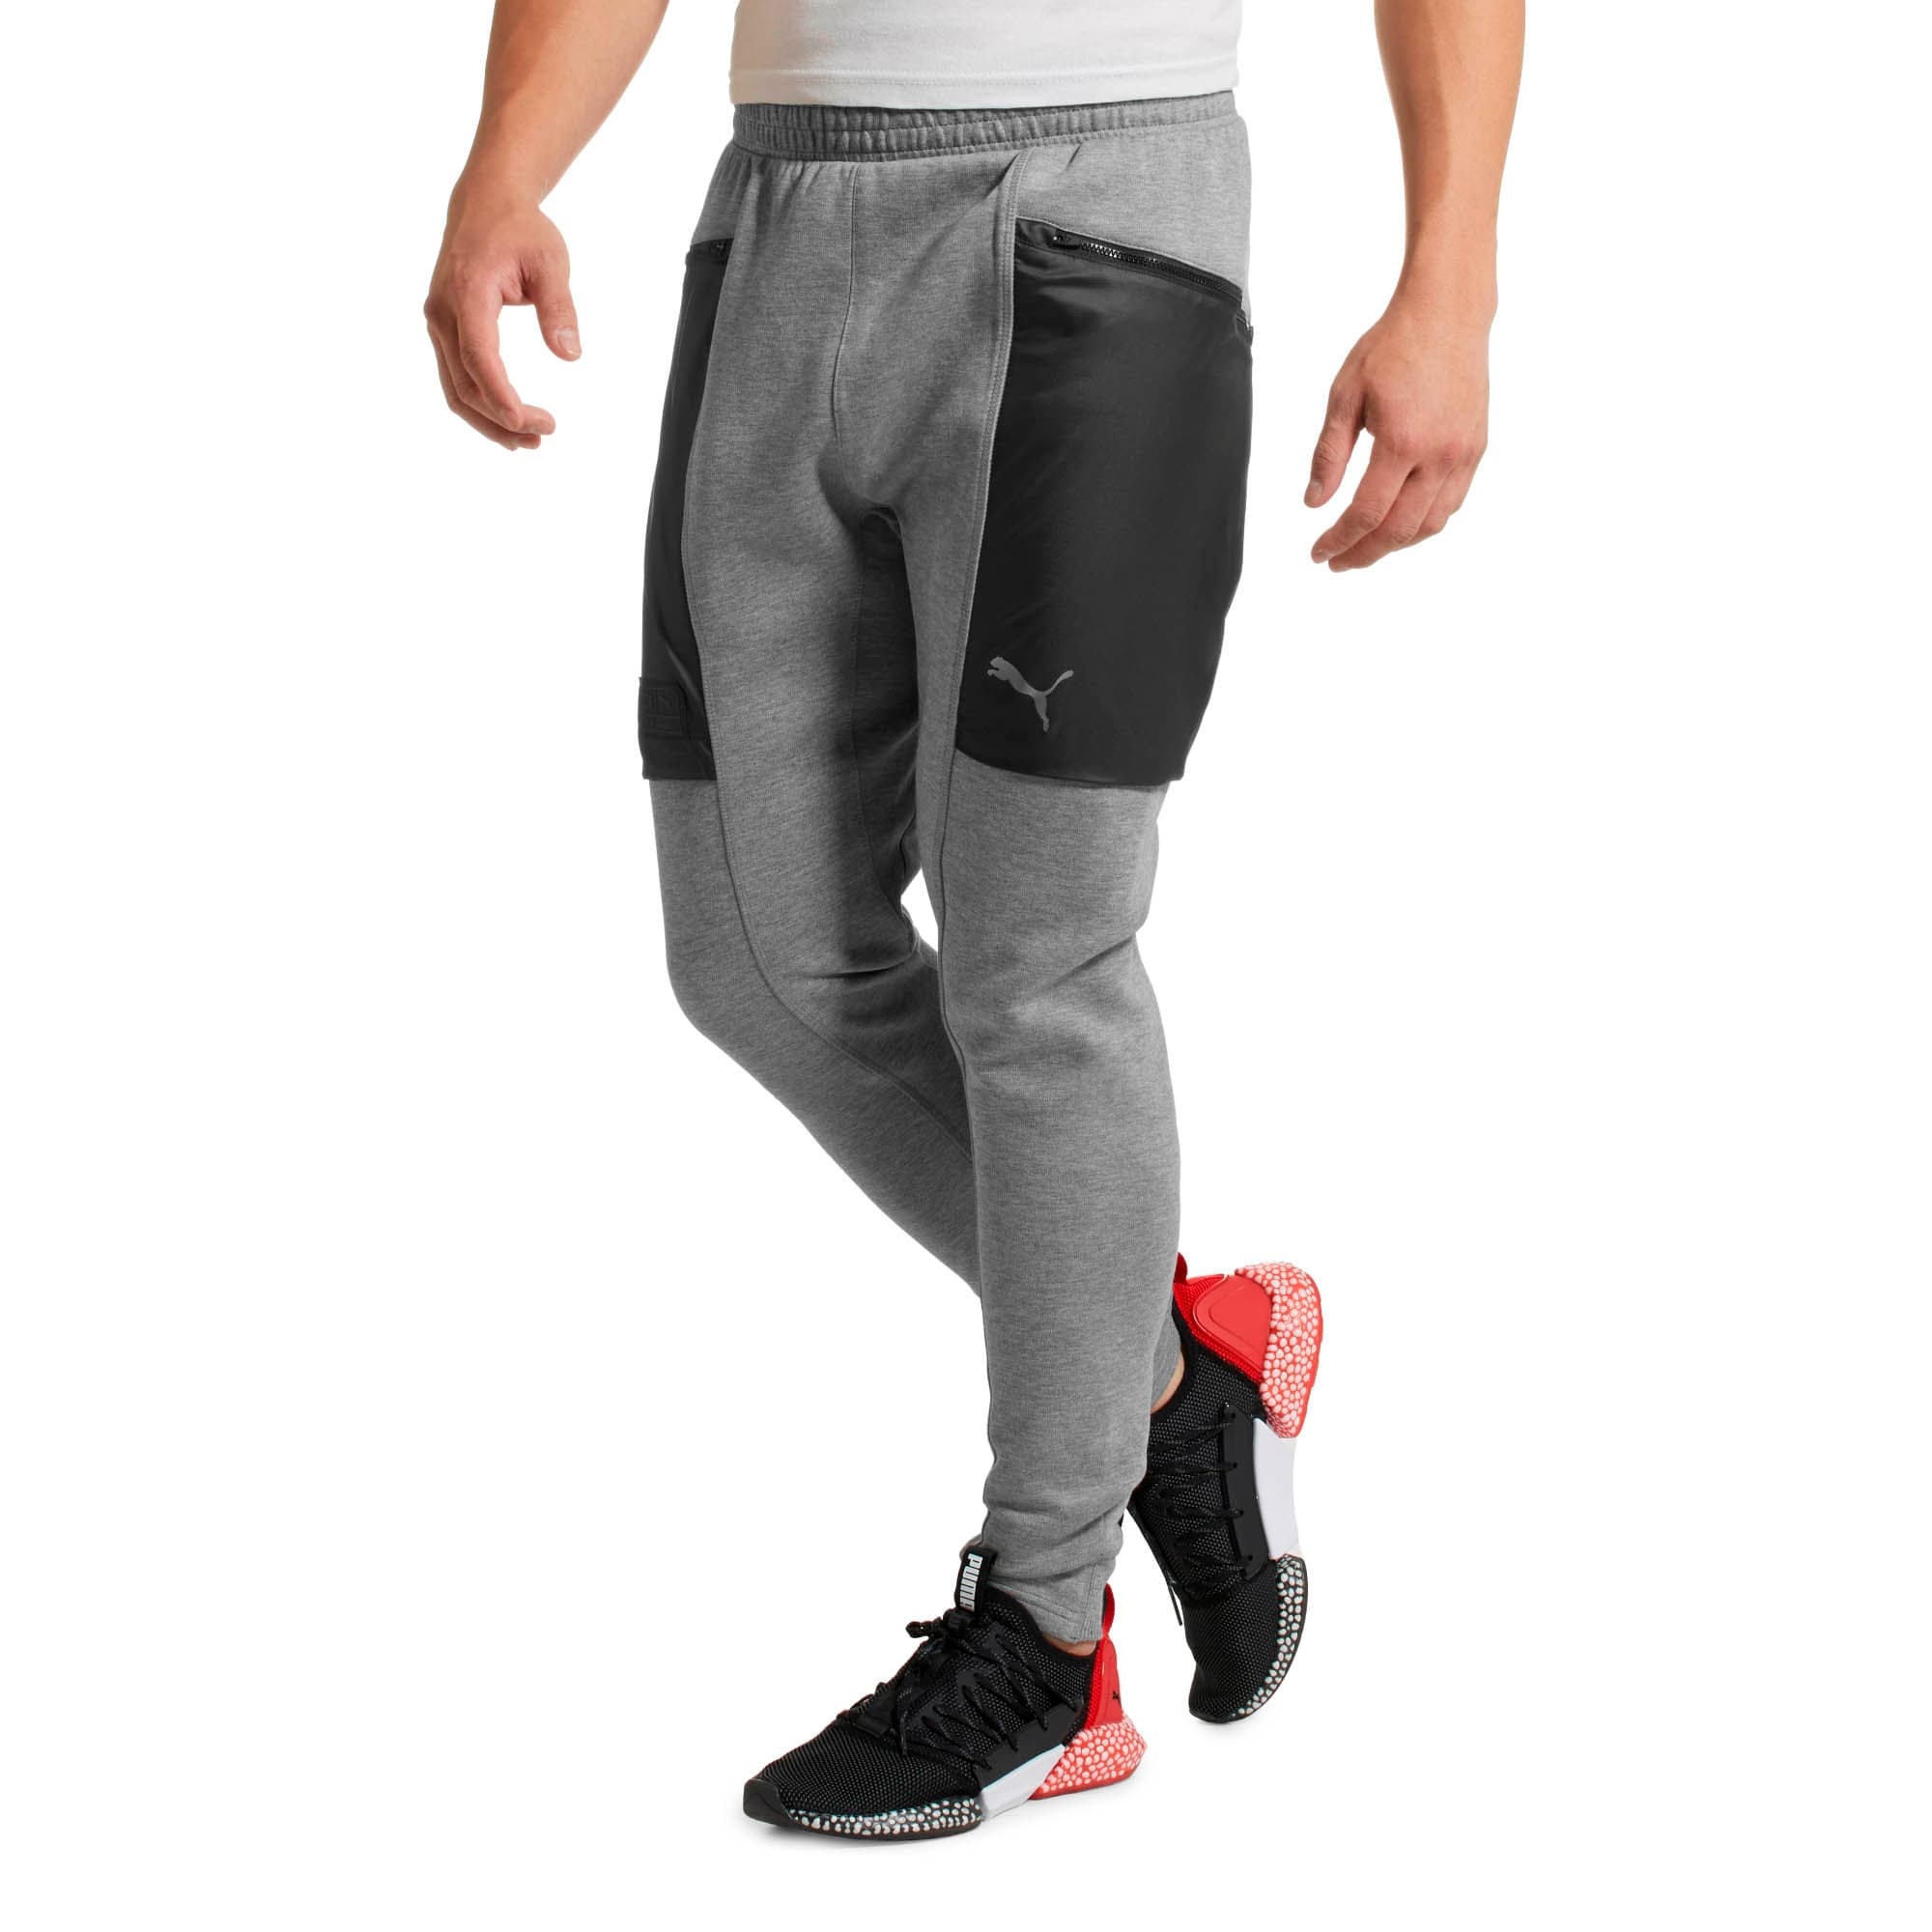 Thumbnail 2 of Energy Actum Men's Running Sweatpants, Medium Gray Heather, medium